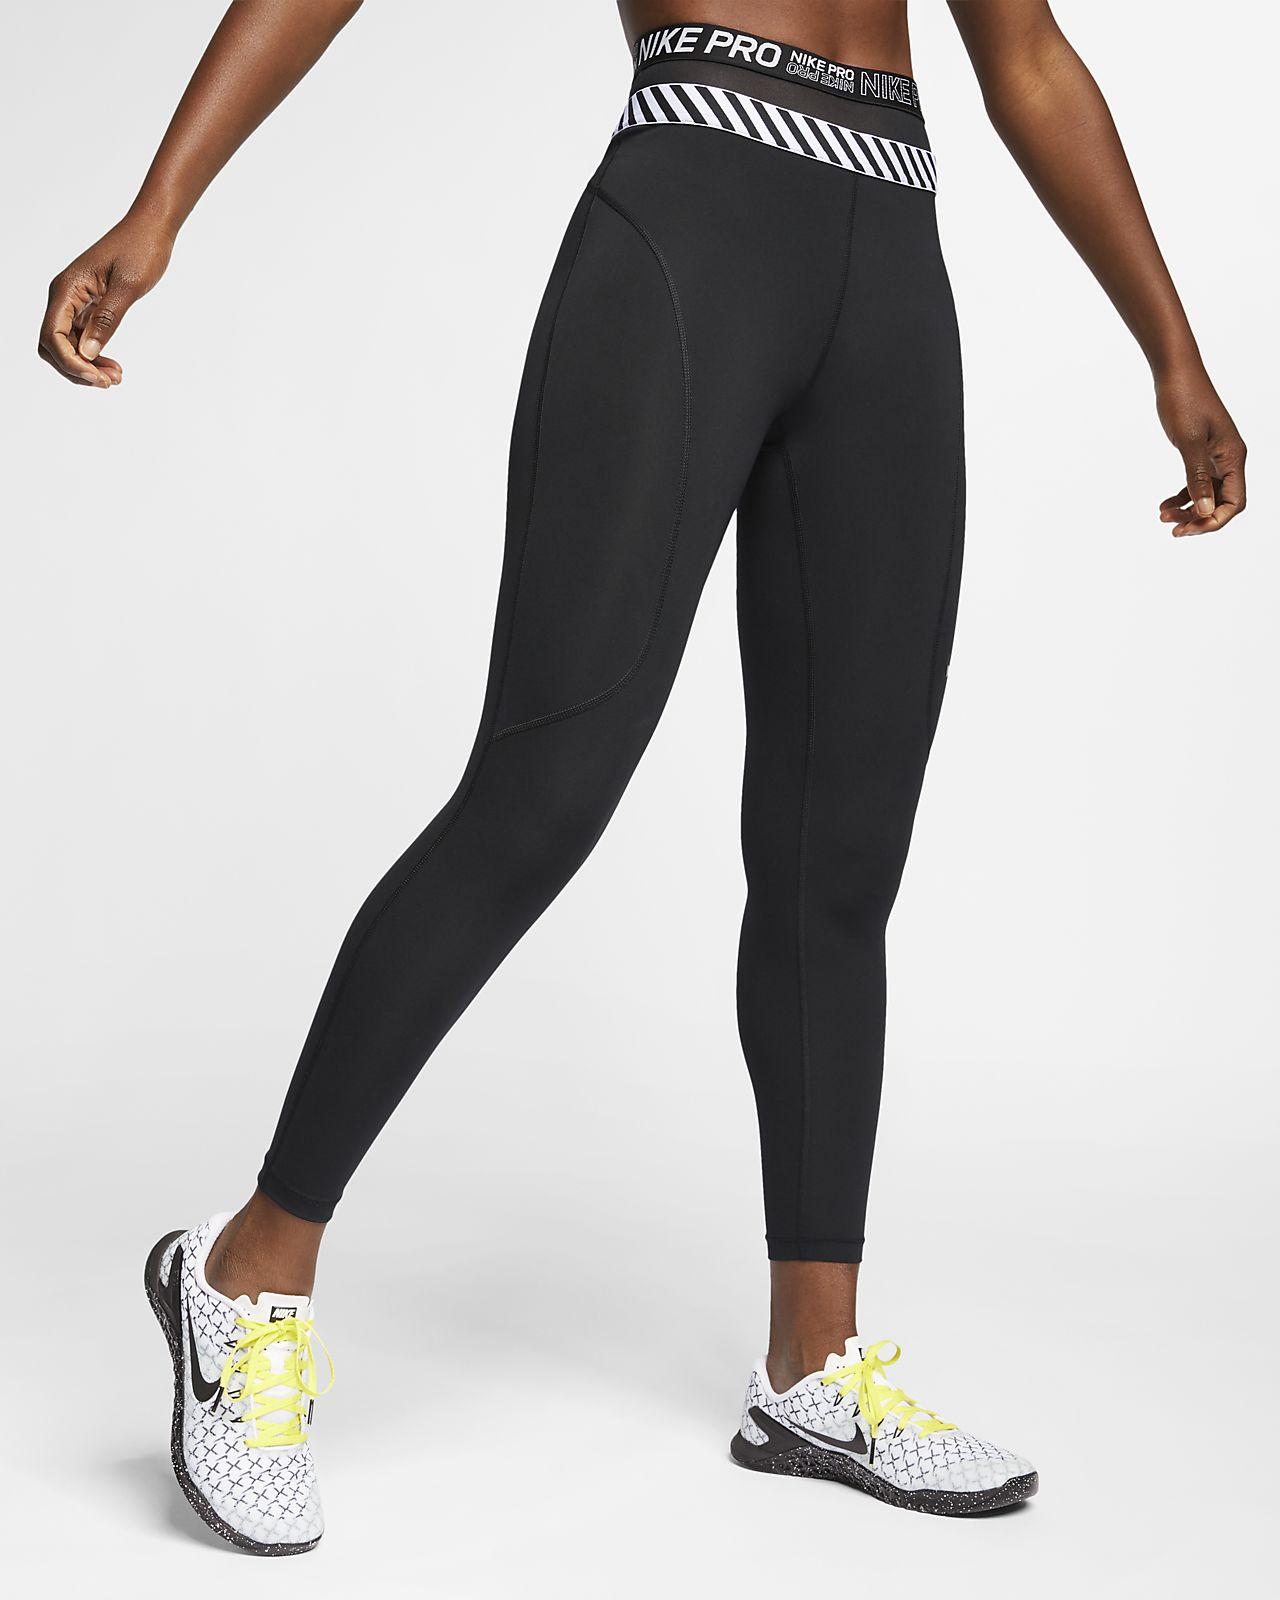 0cc04f14d Mallas de 7 8 de largo para mujer Nike Pro HyperCool. Nike.com MX